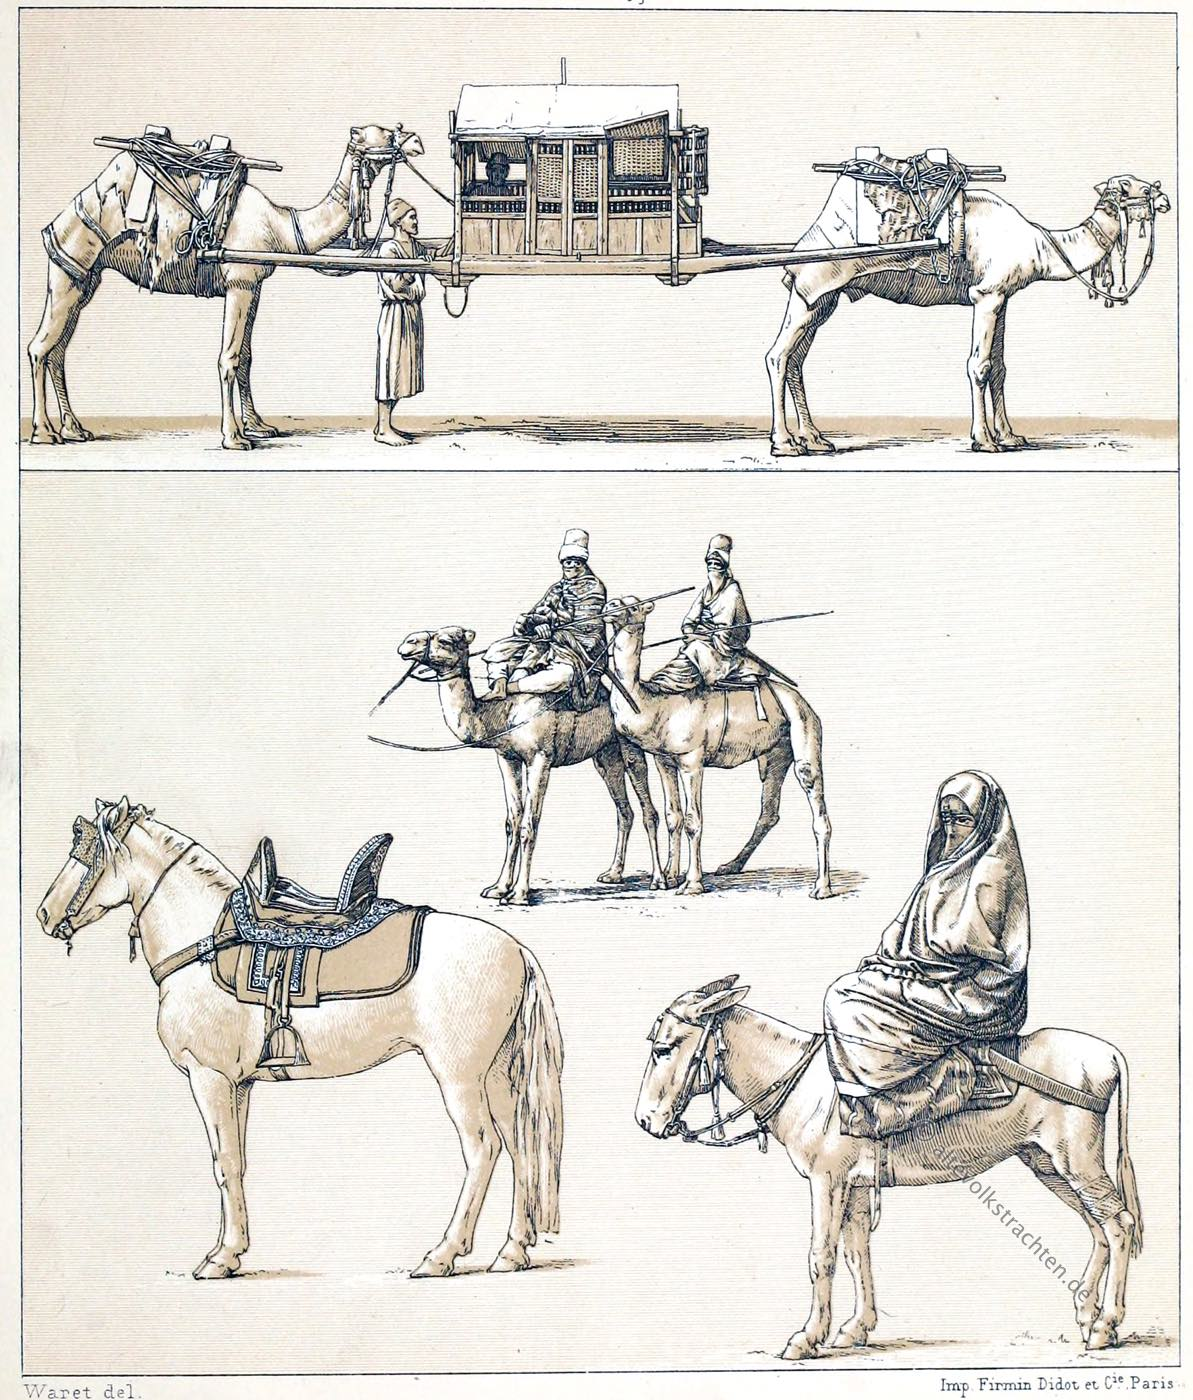 Kamele, Tuaregs, Berber, Lastkamel, Ägypterin, Strassentracht, Lasttiere,